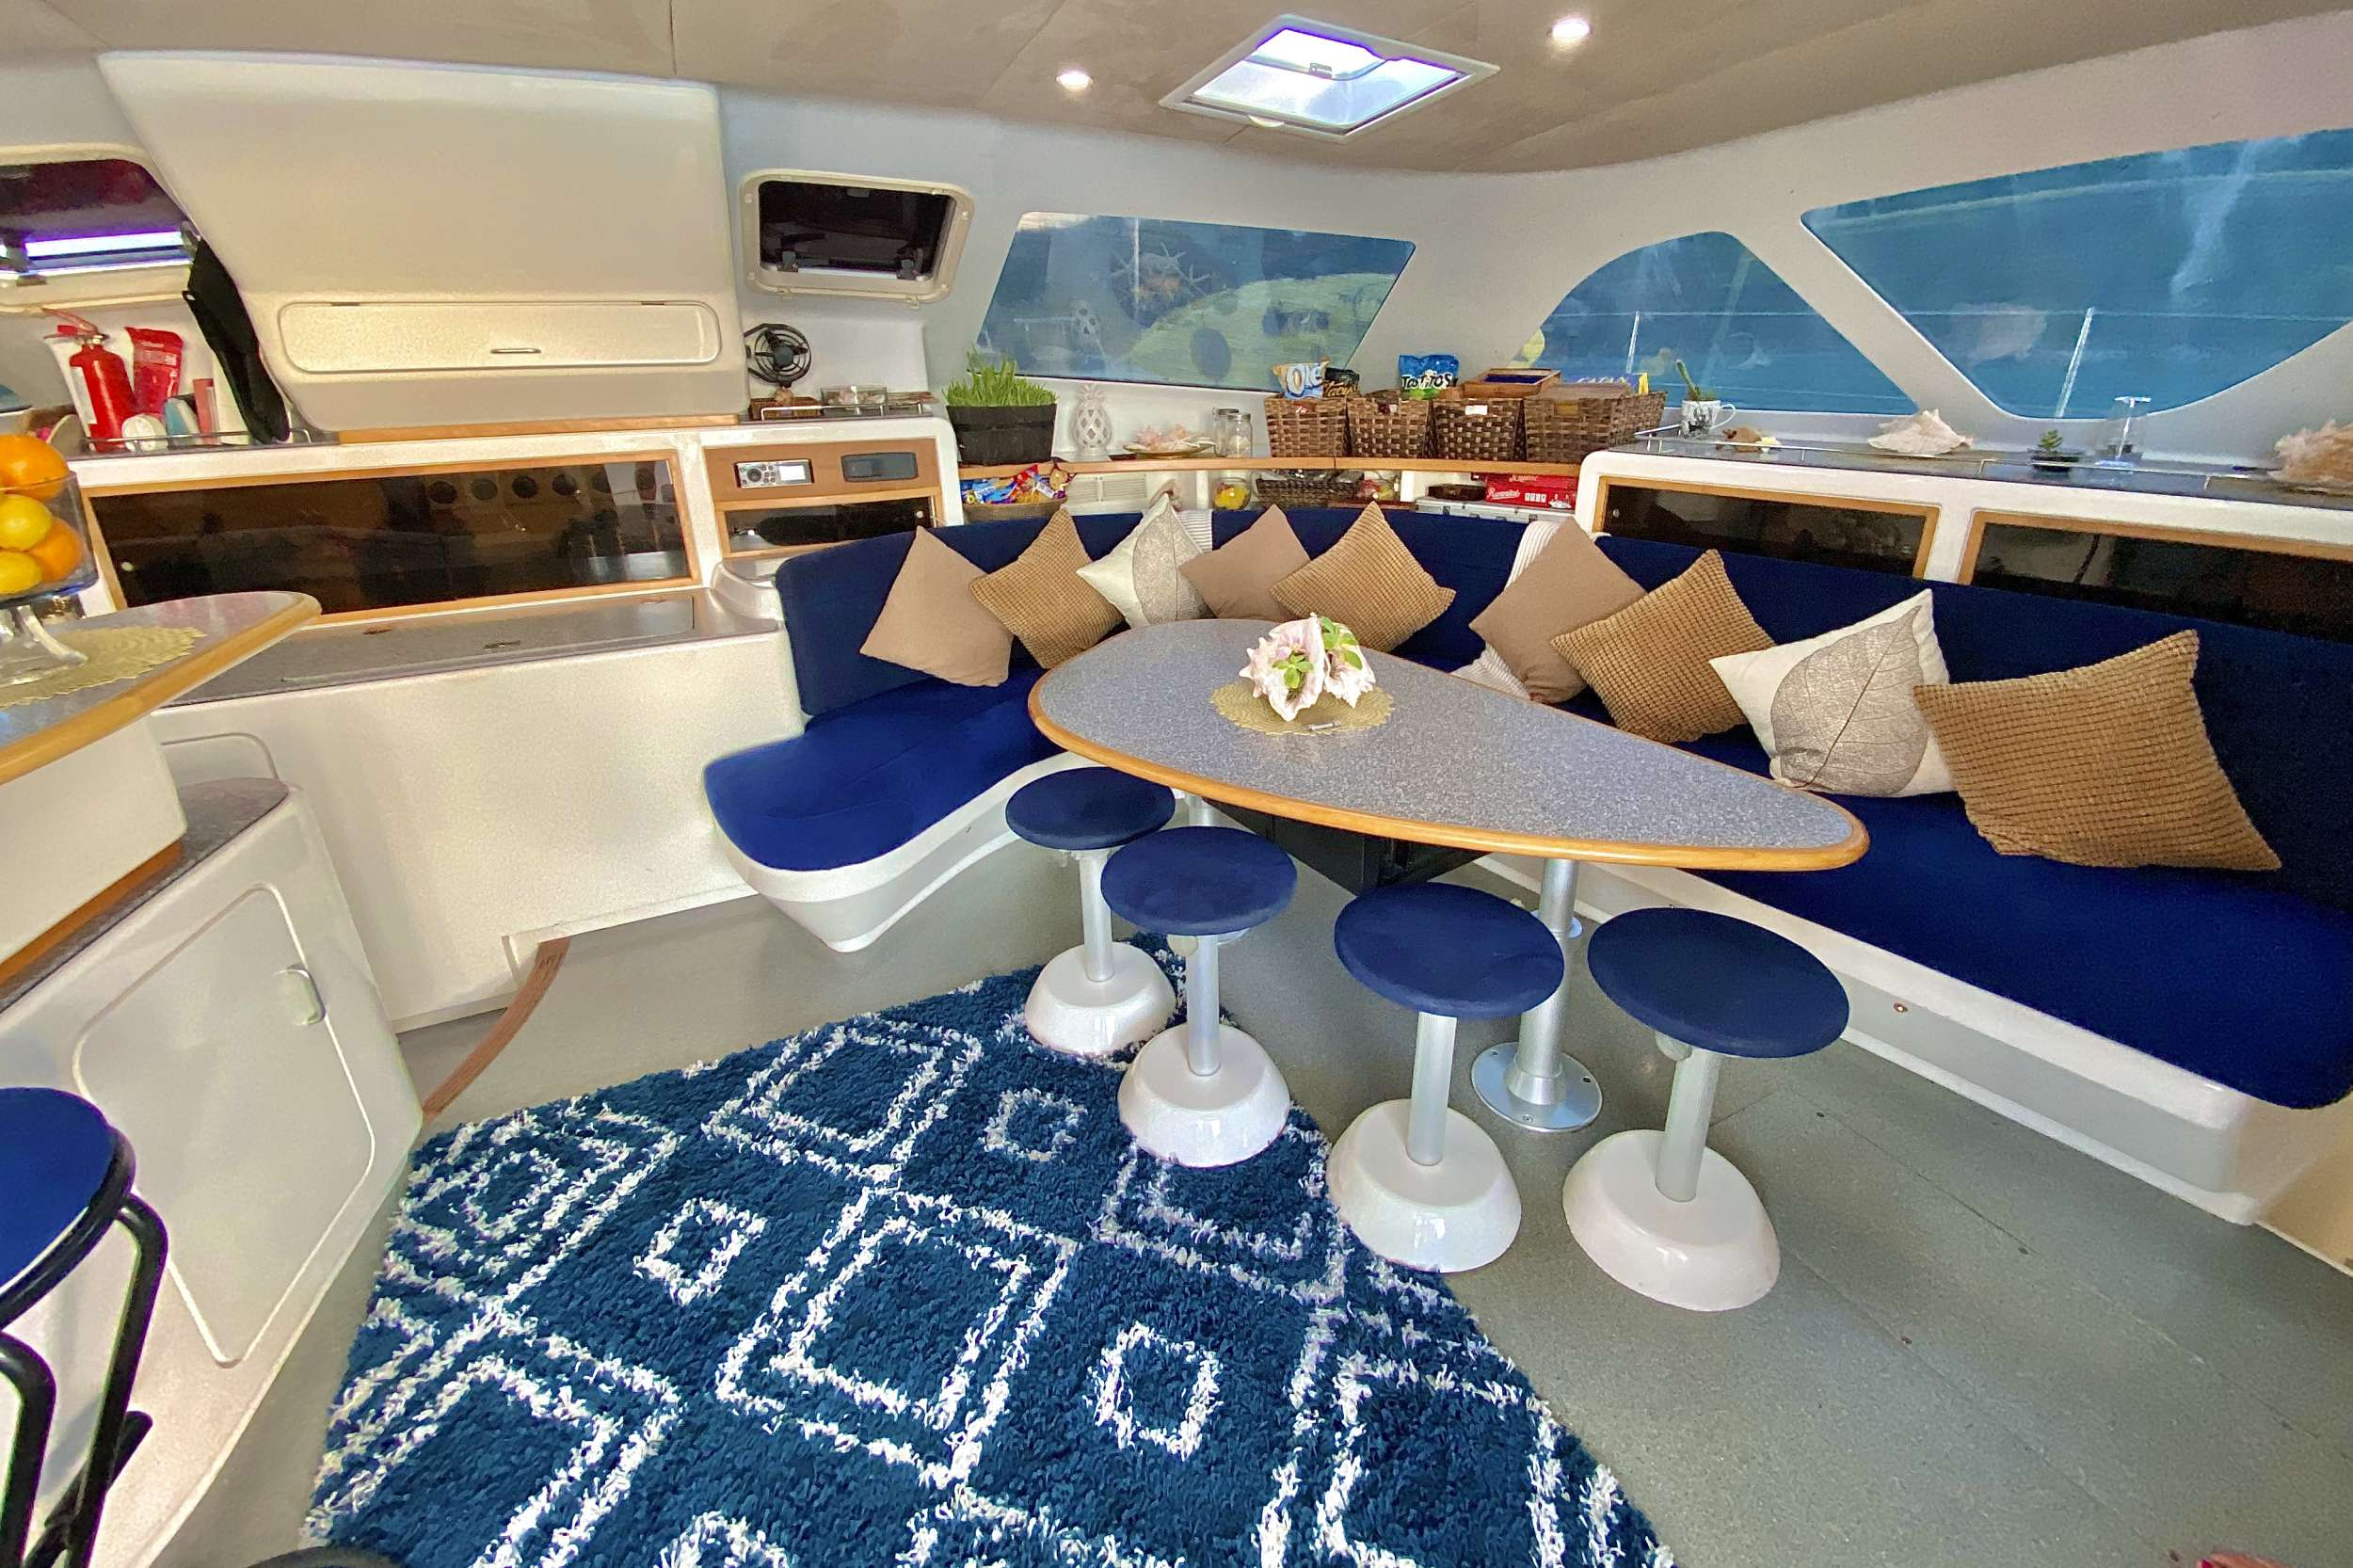 Salon seating area